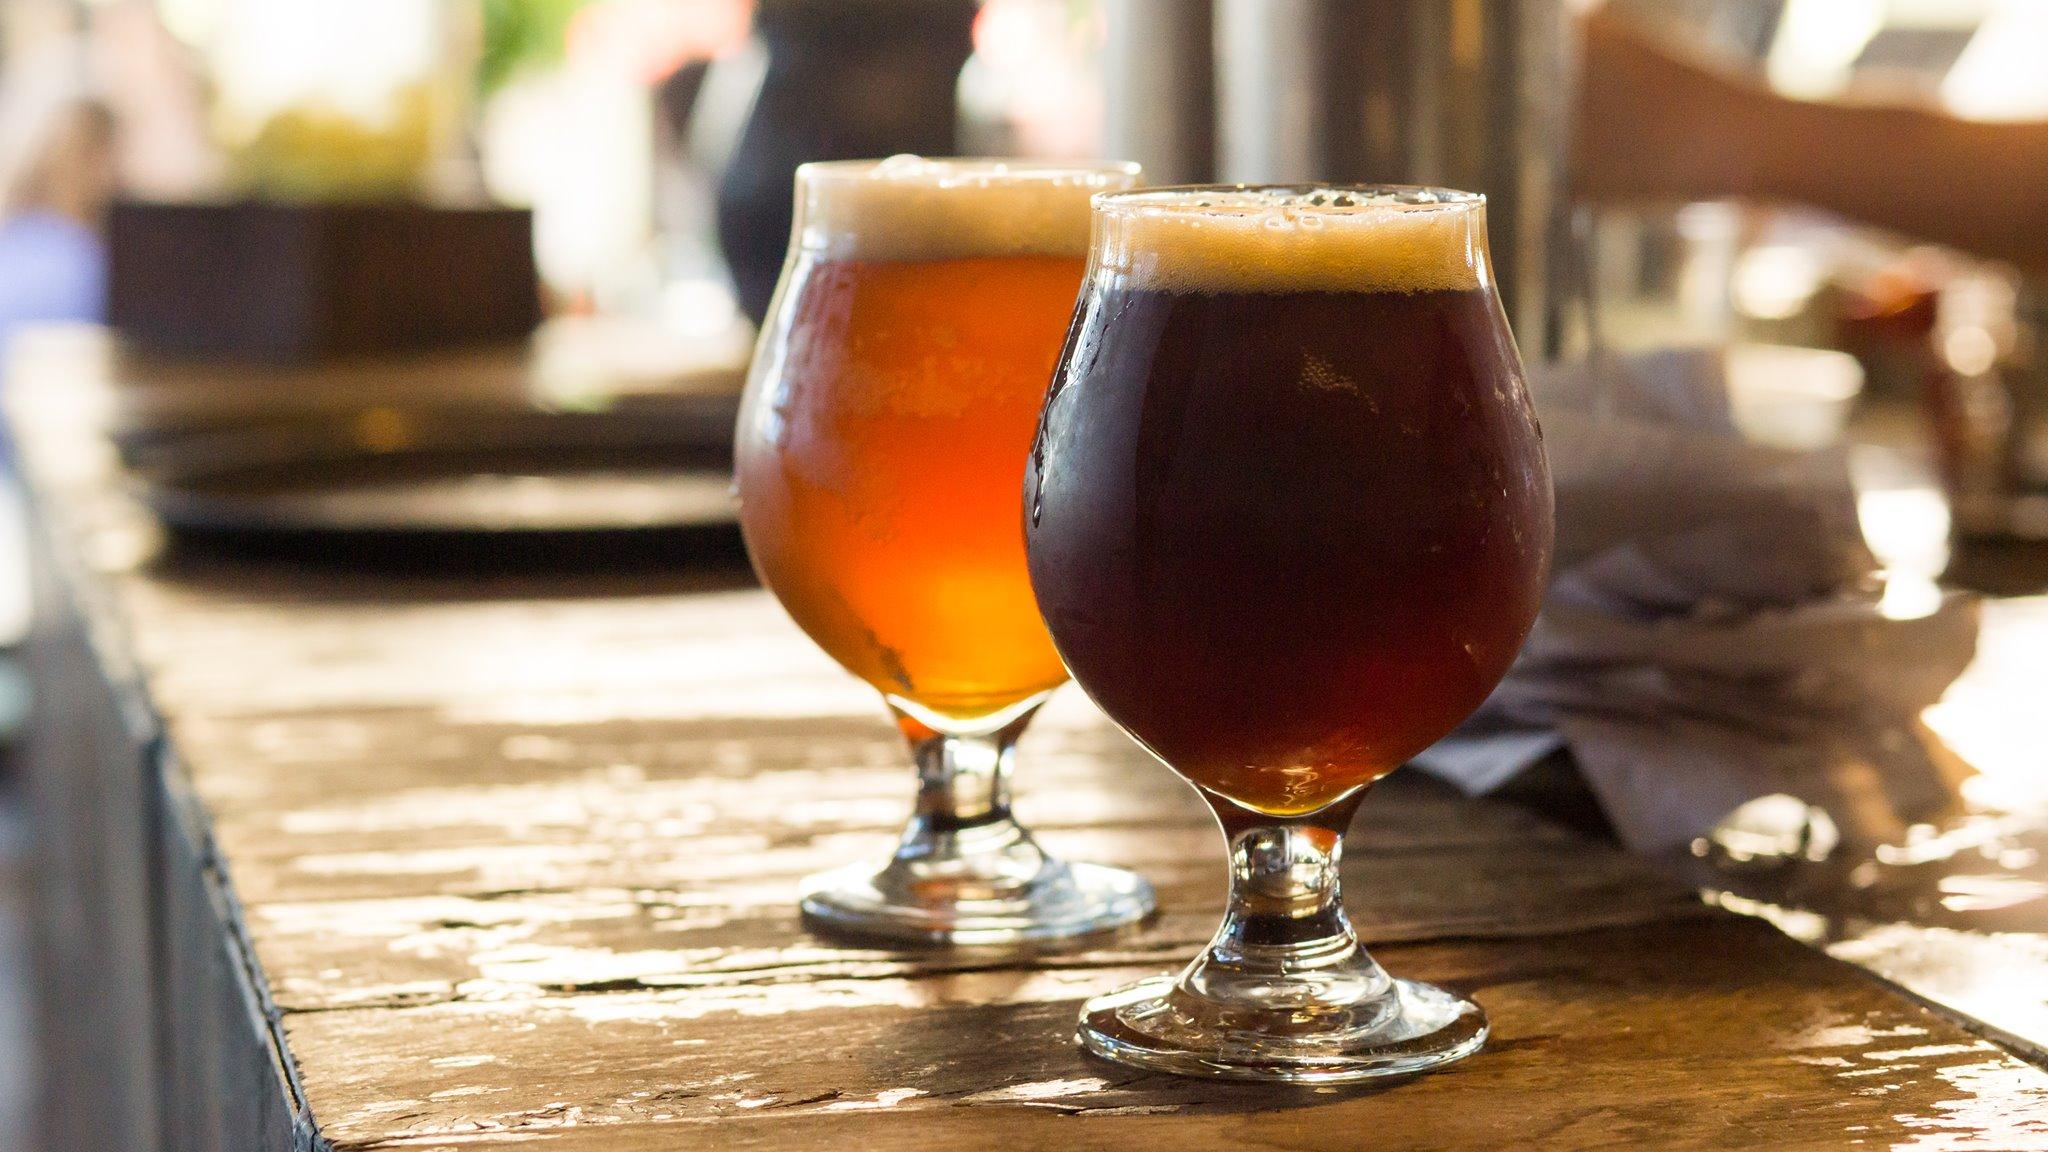 Mmmm.... beer